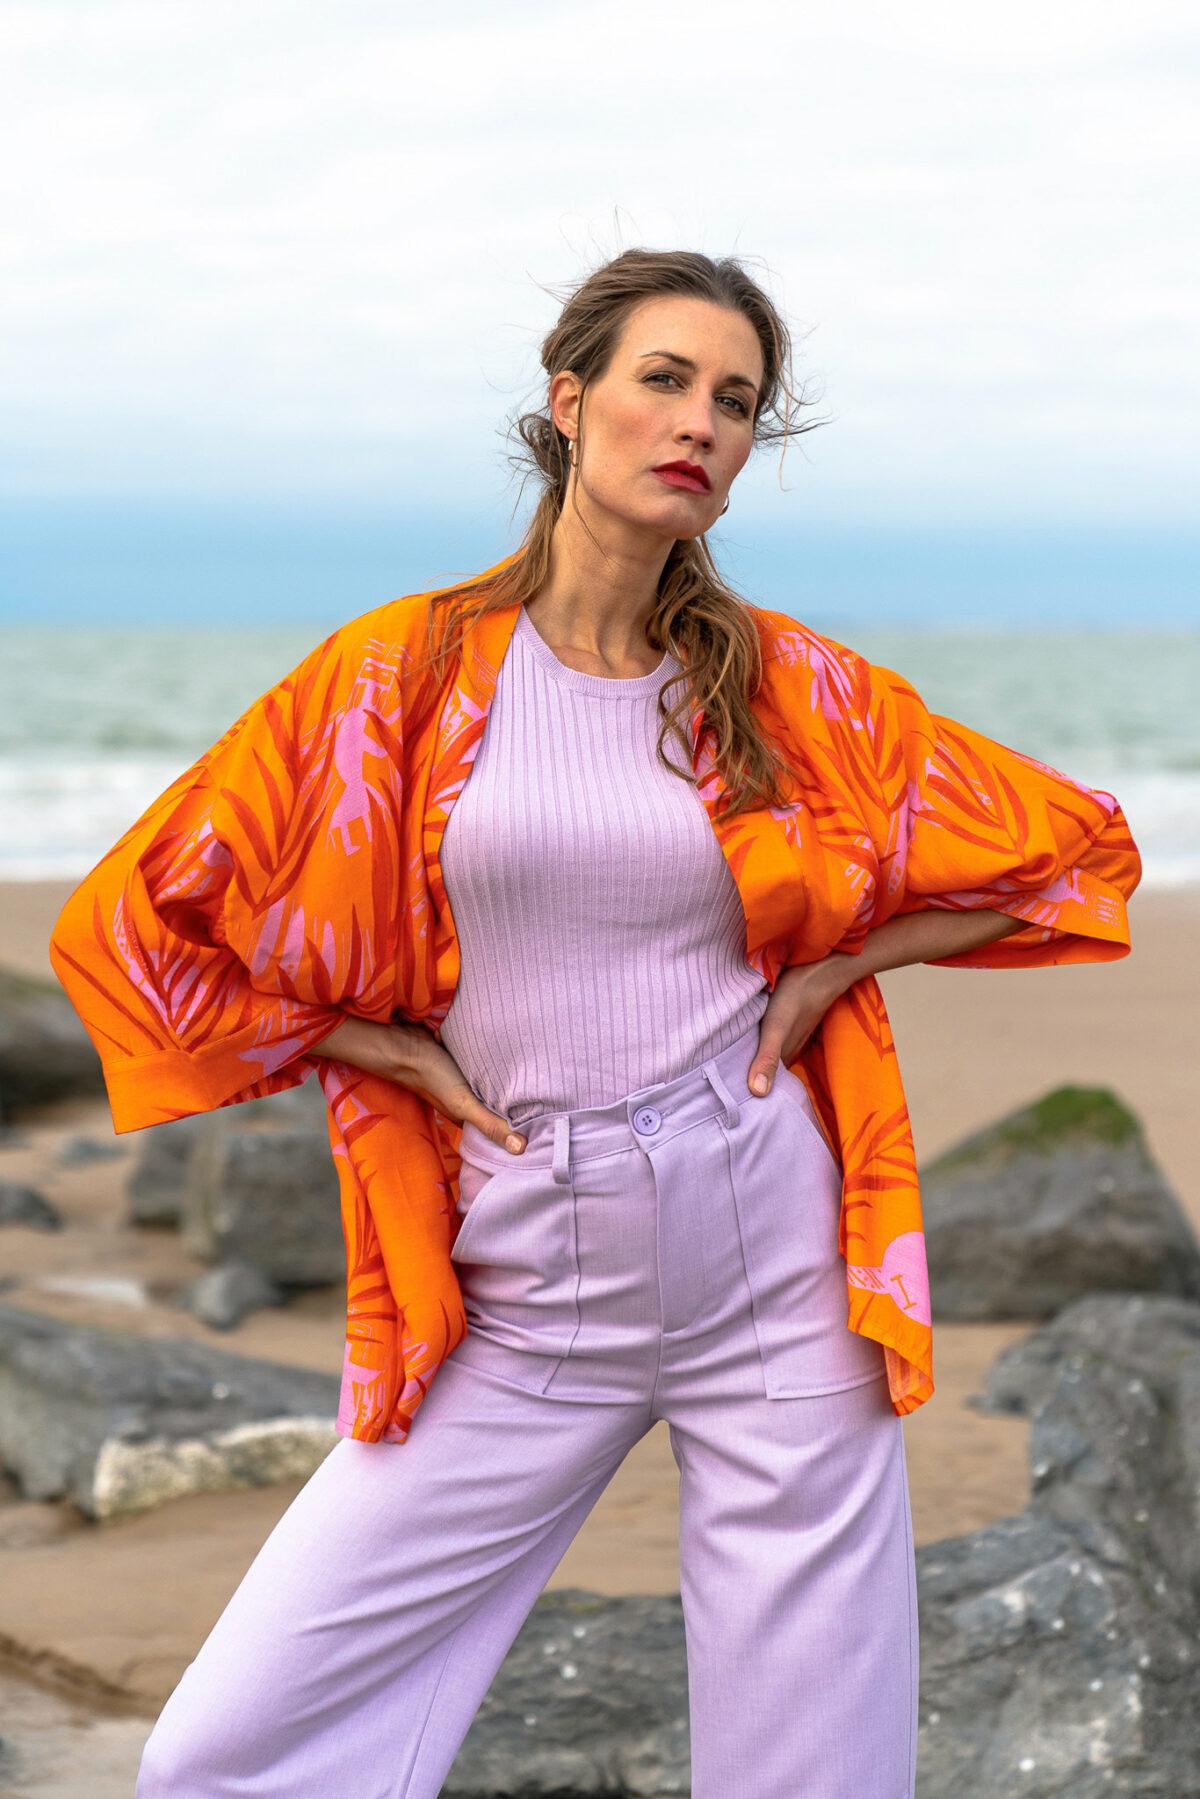 woman with a lilac top lilac pants and an orange kimono